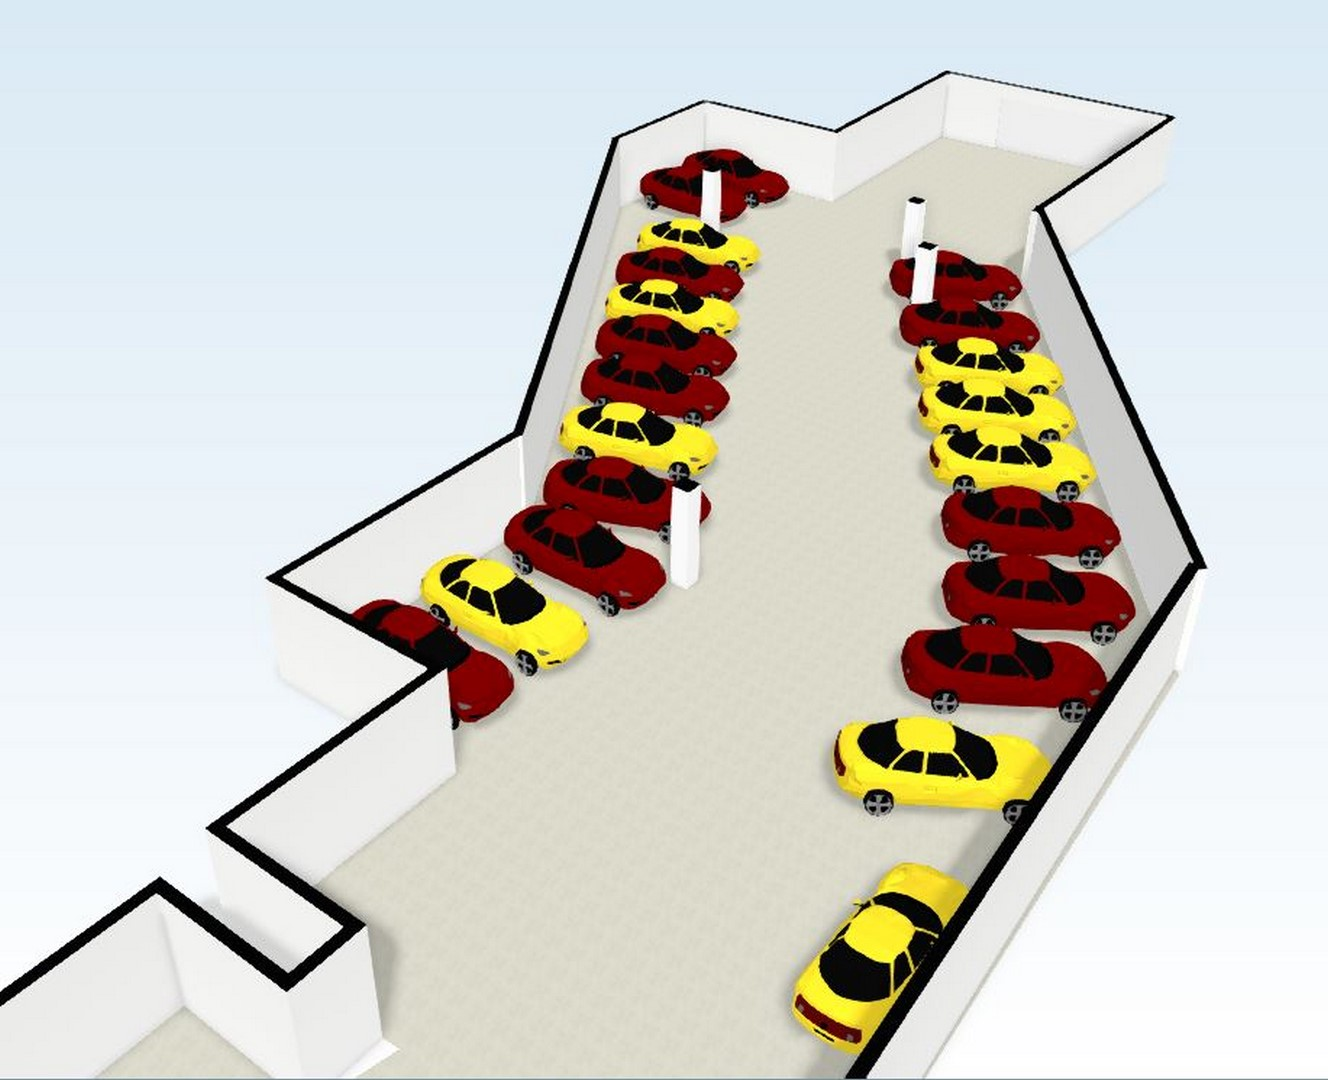 Alquiler Parking coche  Plaza pare oriol, 4. Plazas de parking des de 50 euros para coche y 20 para moto.